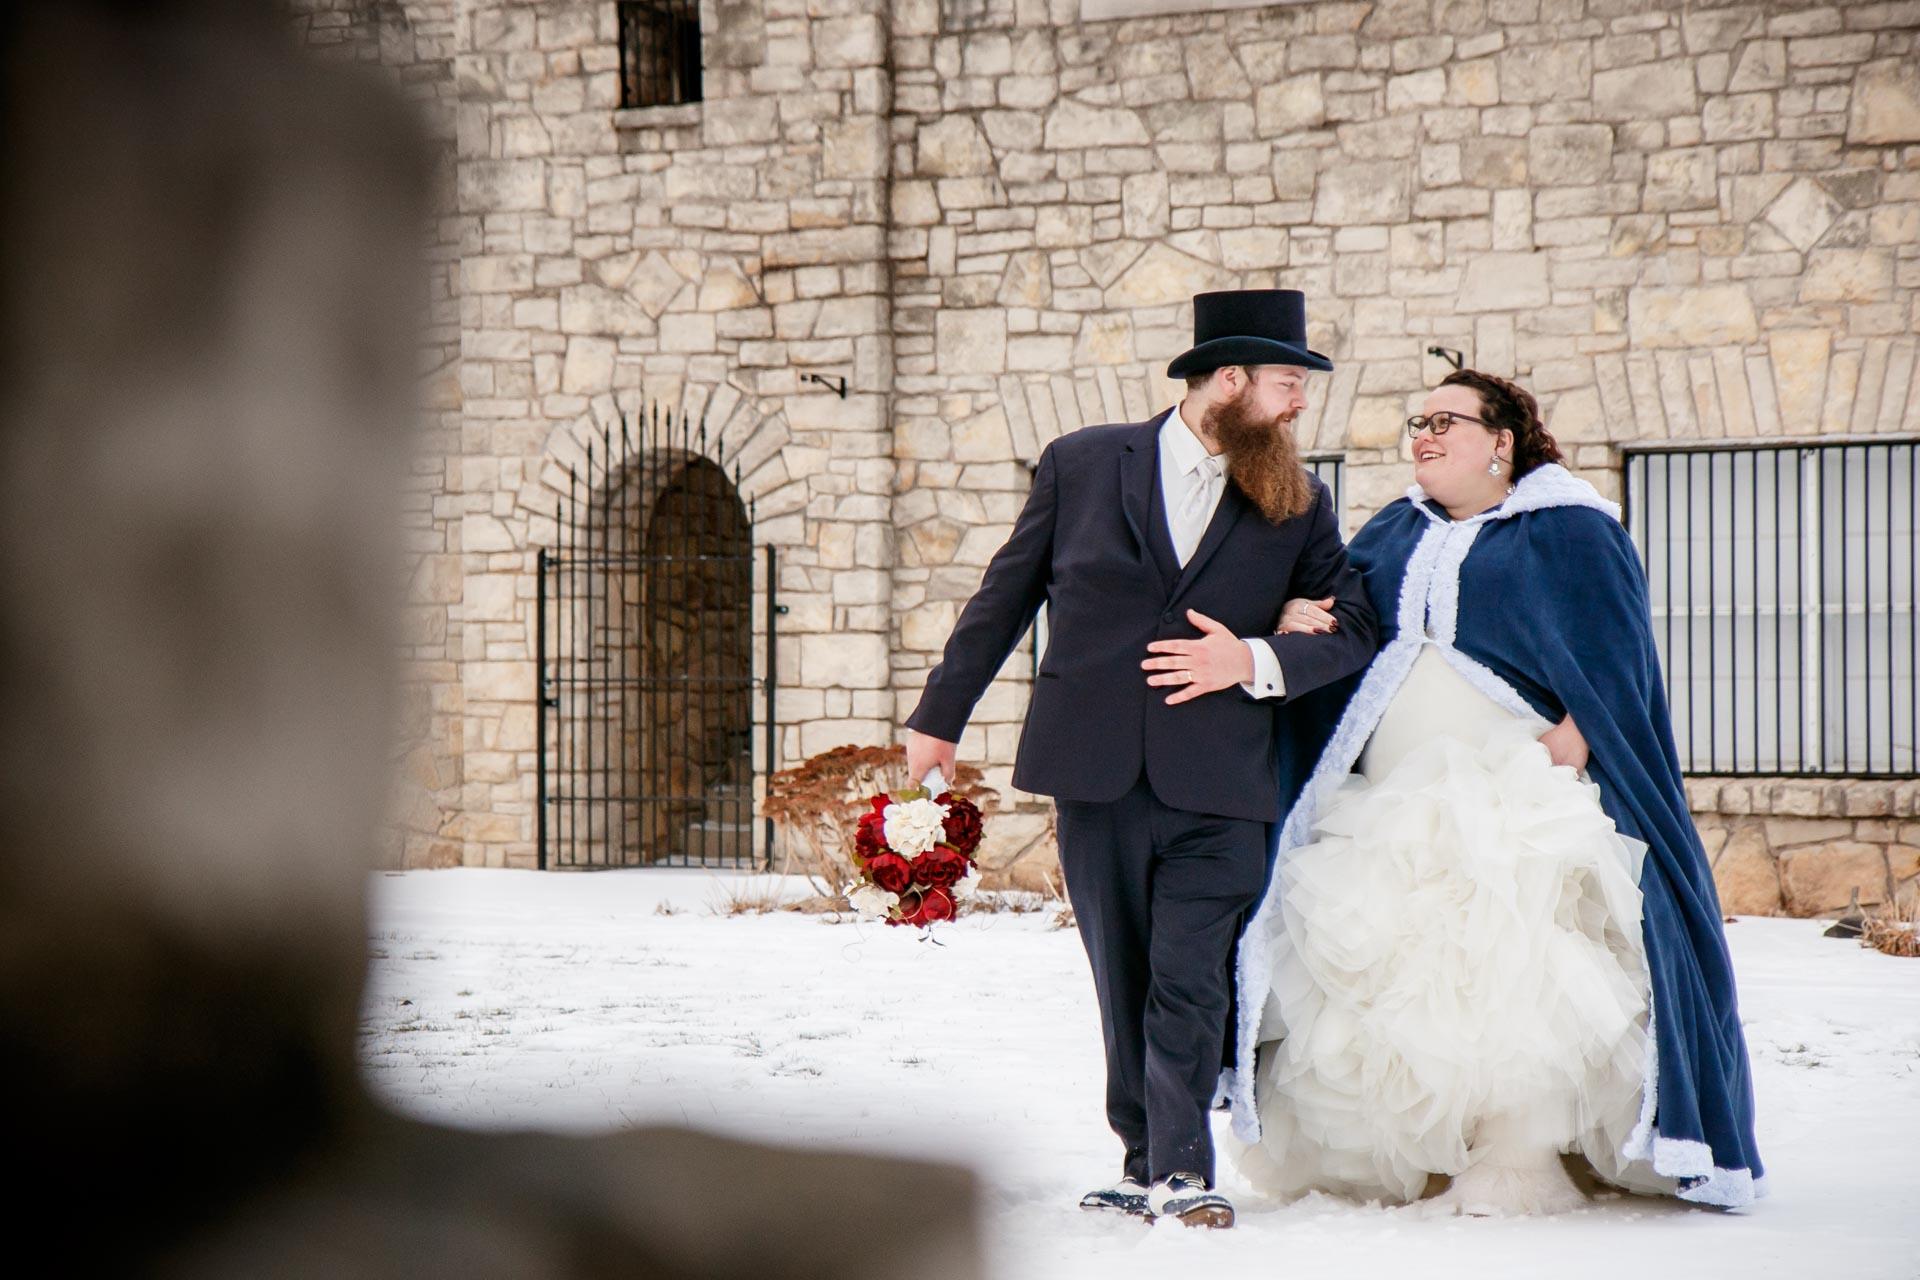 wedding-adam-shea-photography-green-bay-appleton-neenah-photographer-02.jpg